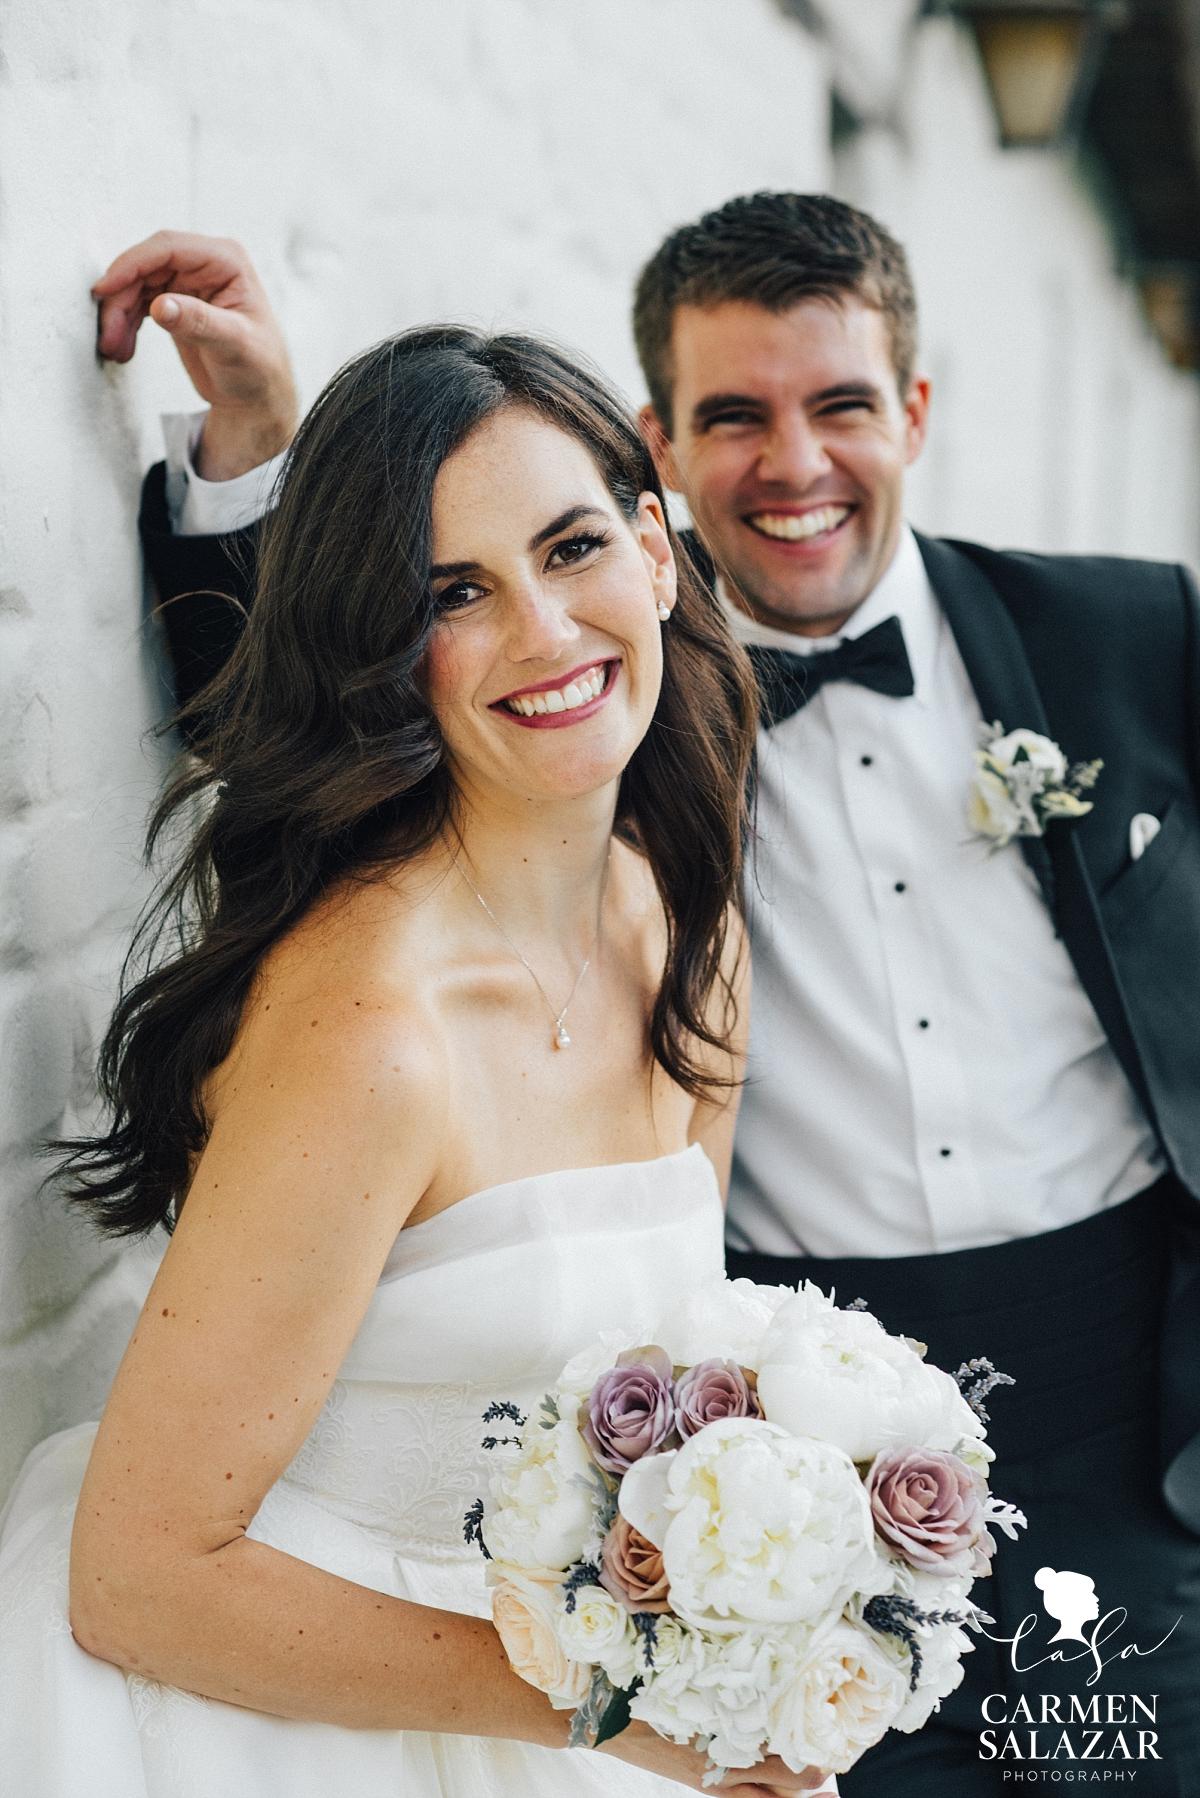 Traditional bride and groom wedding apparel - Carmen Salazar